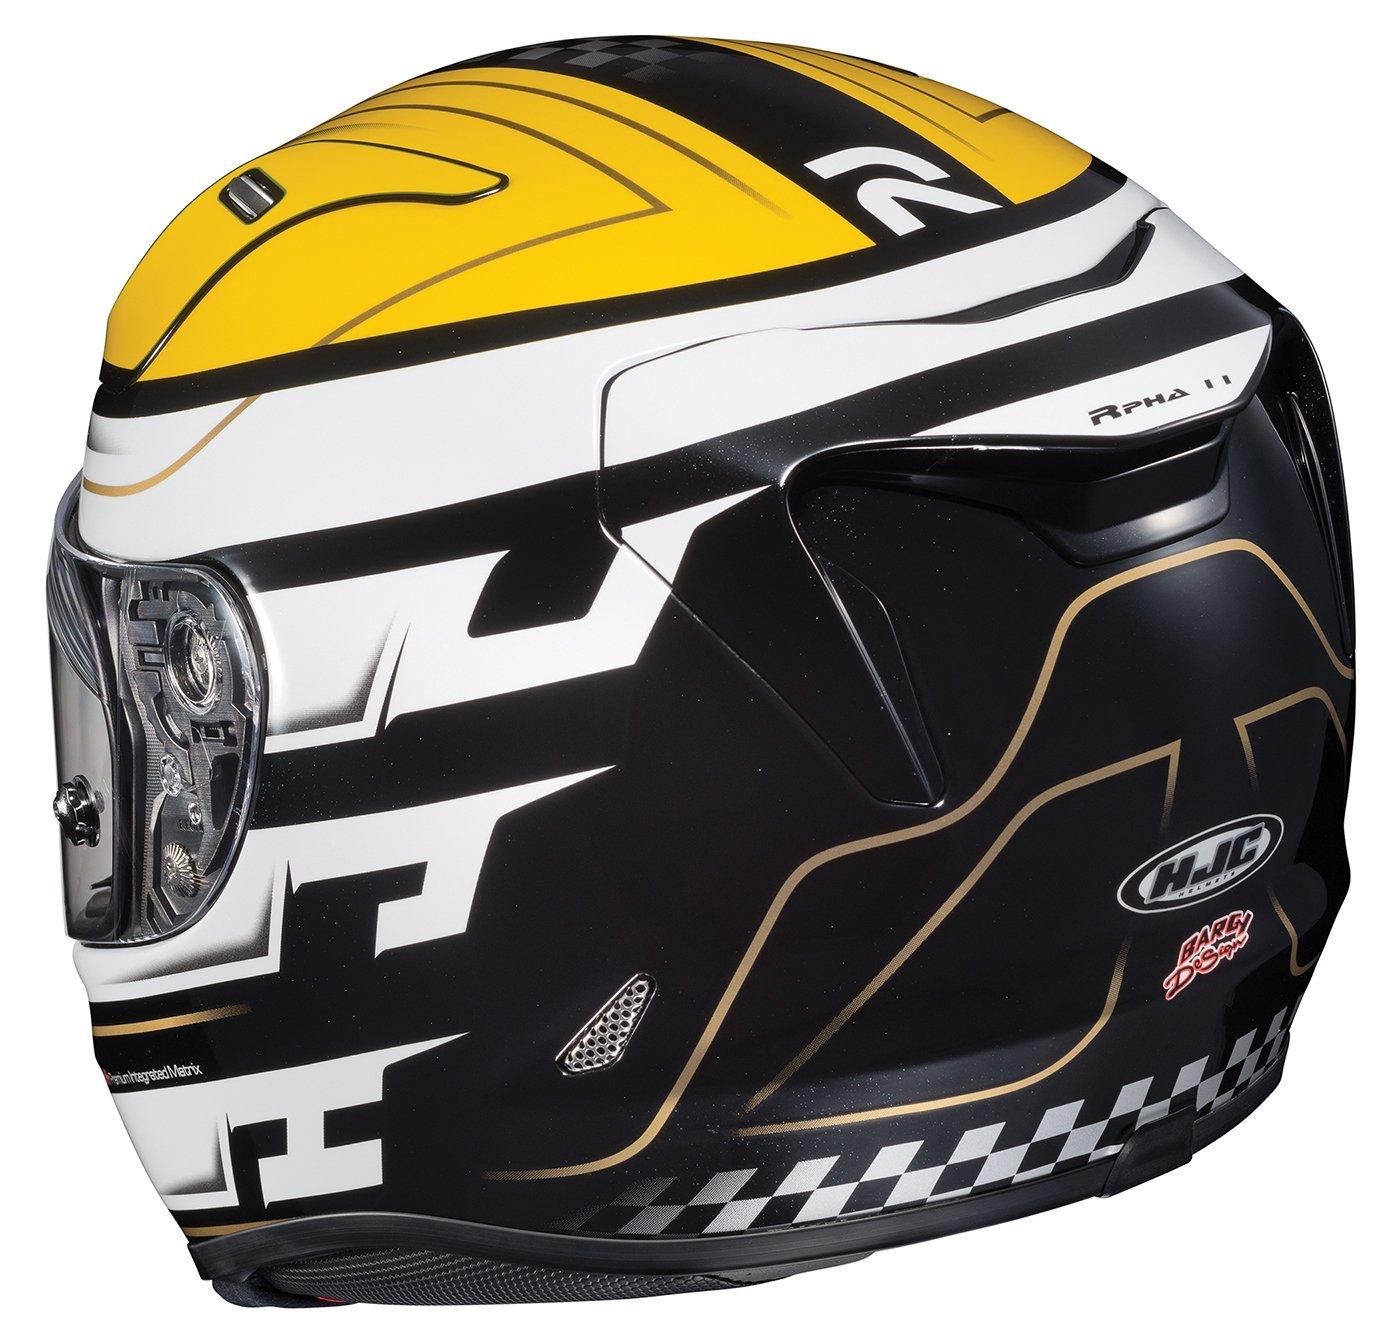 HJC Helmets 1654-933 Yellow//White//Black Medium Rpha-11 Pro Skyrym Helmet